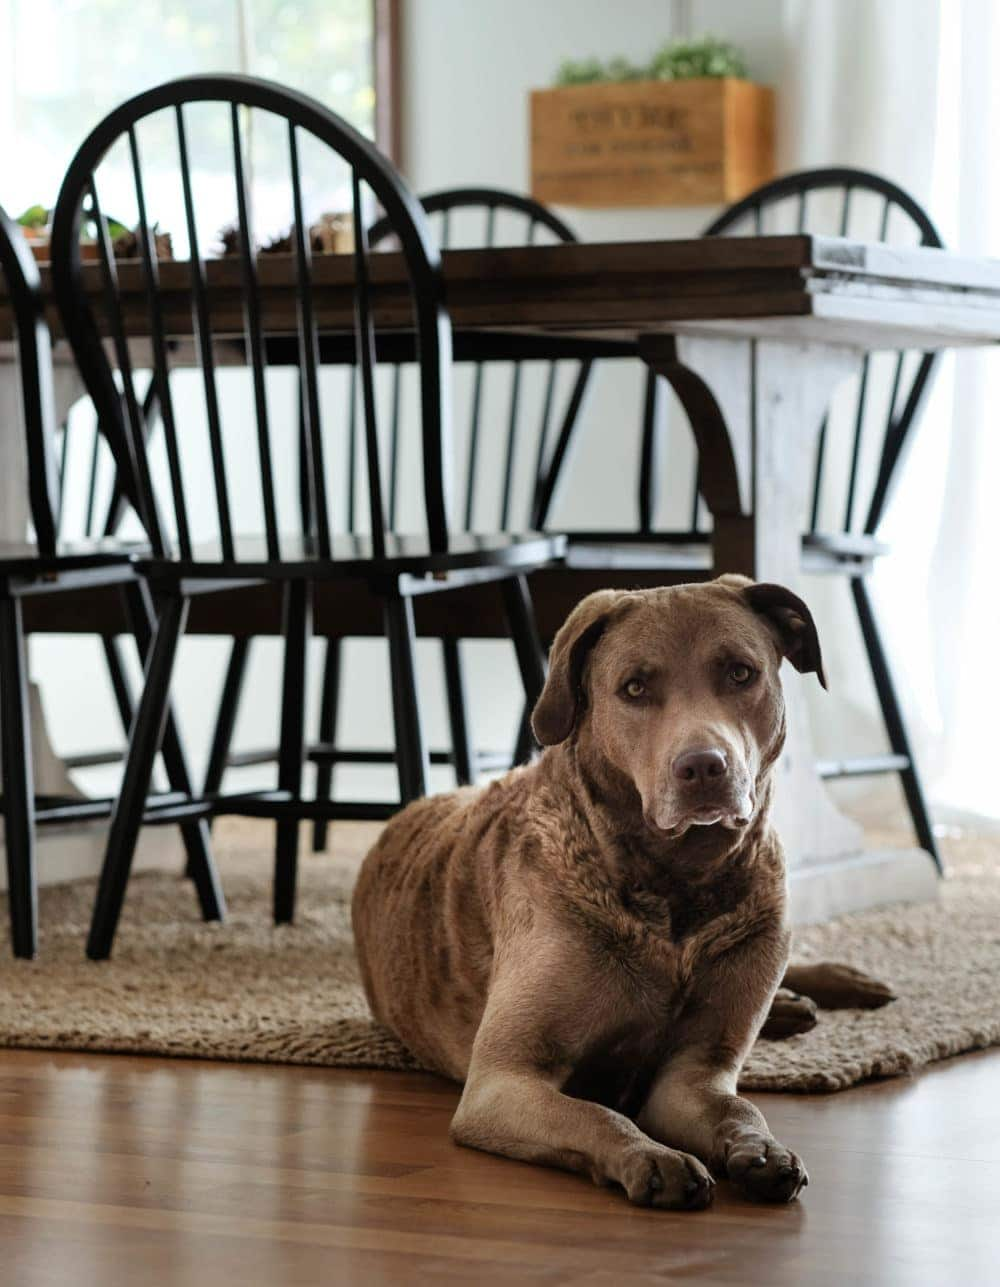 chesapeake bay retriever dog laying on jute rug